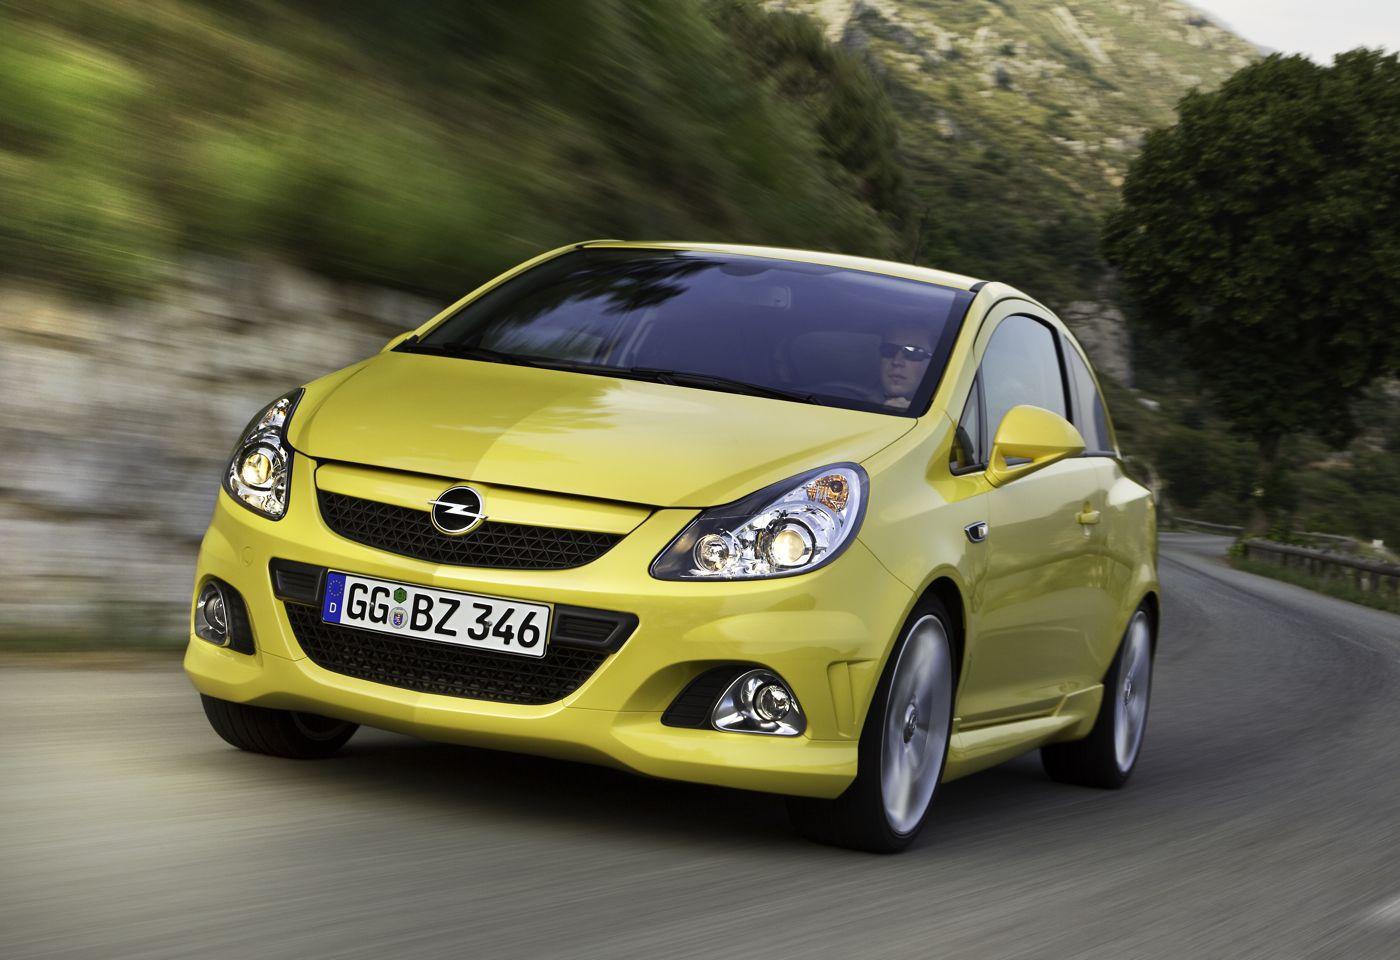 2010 Opel Corsa OPC photo - 2